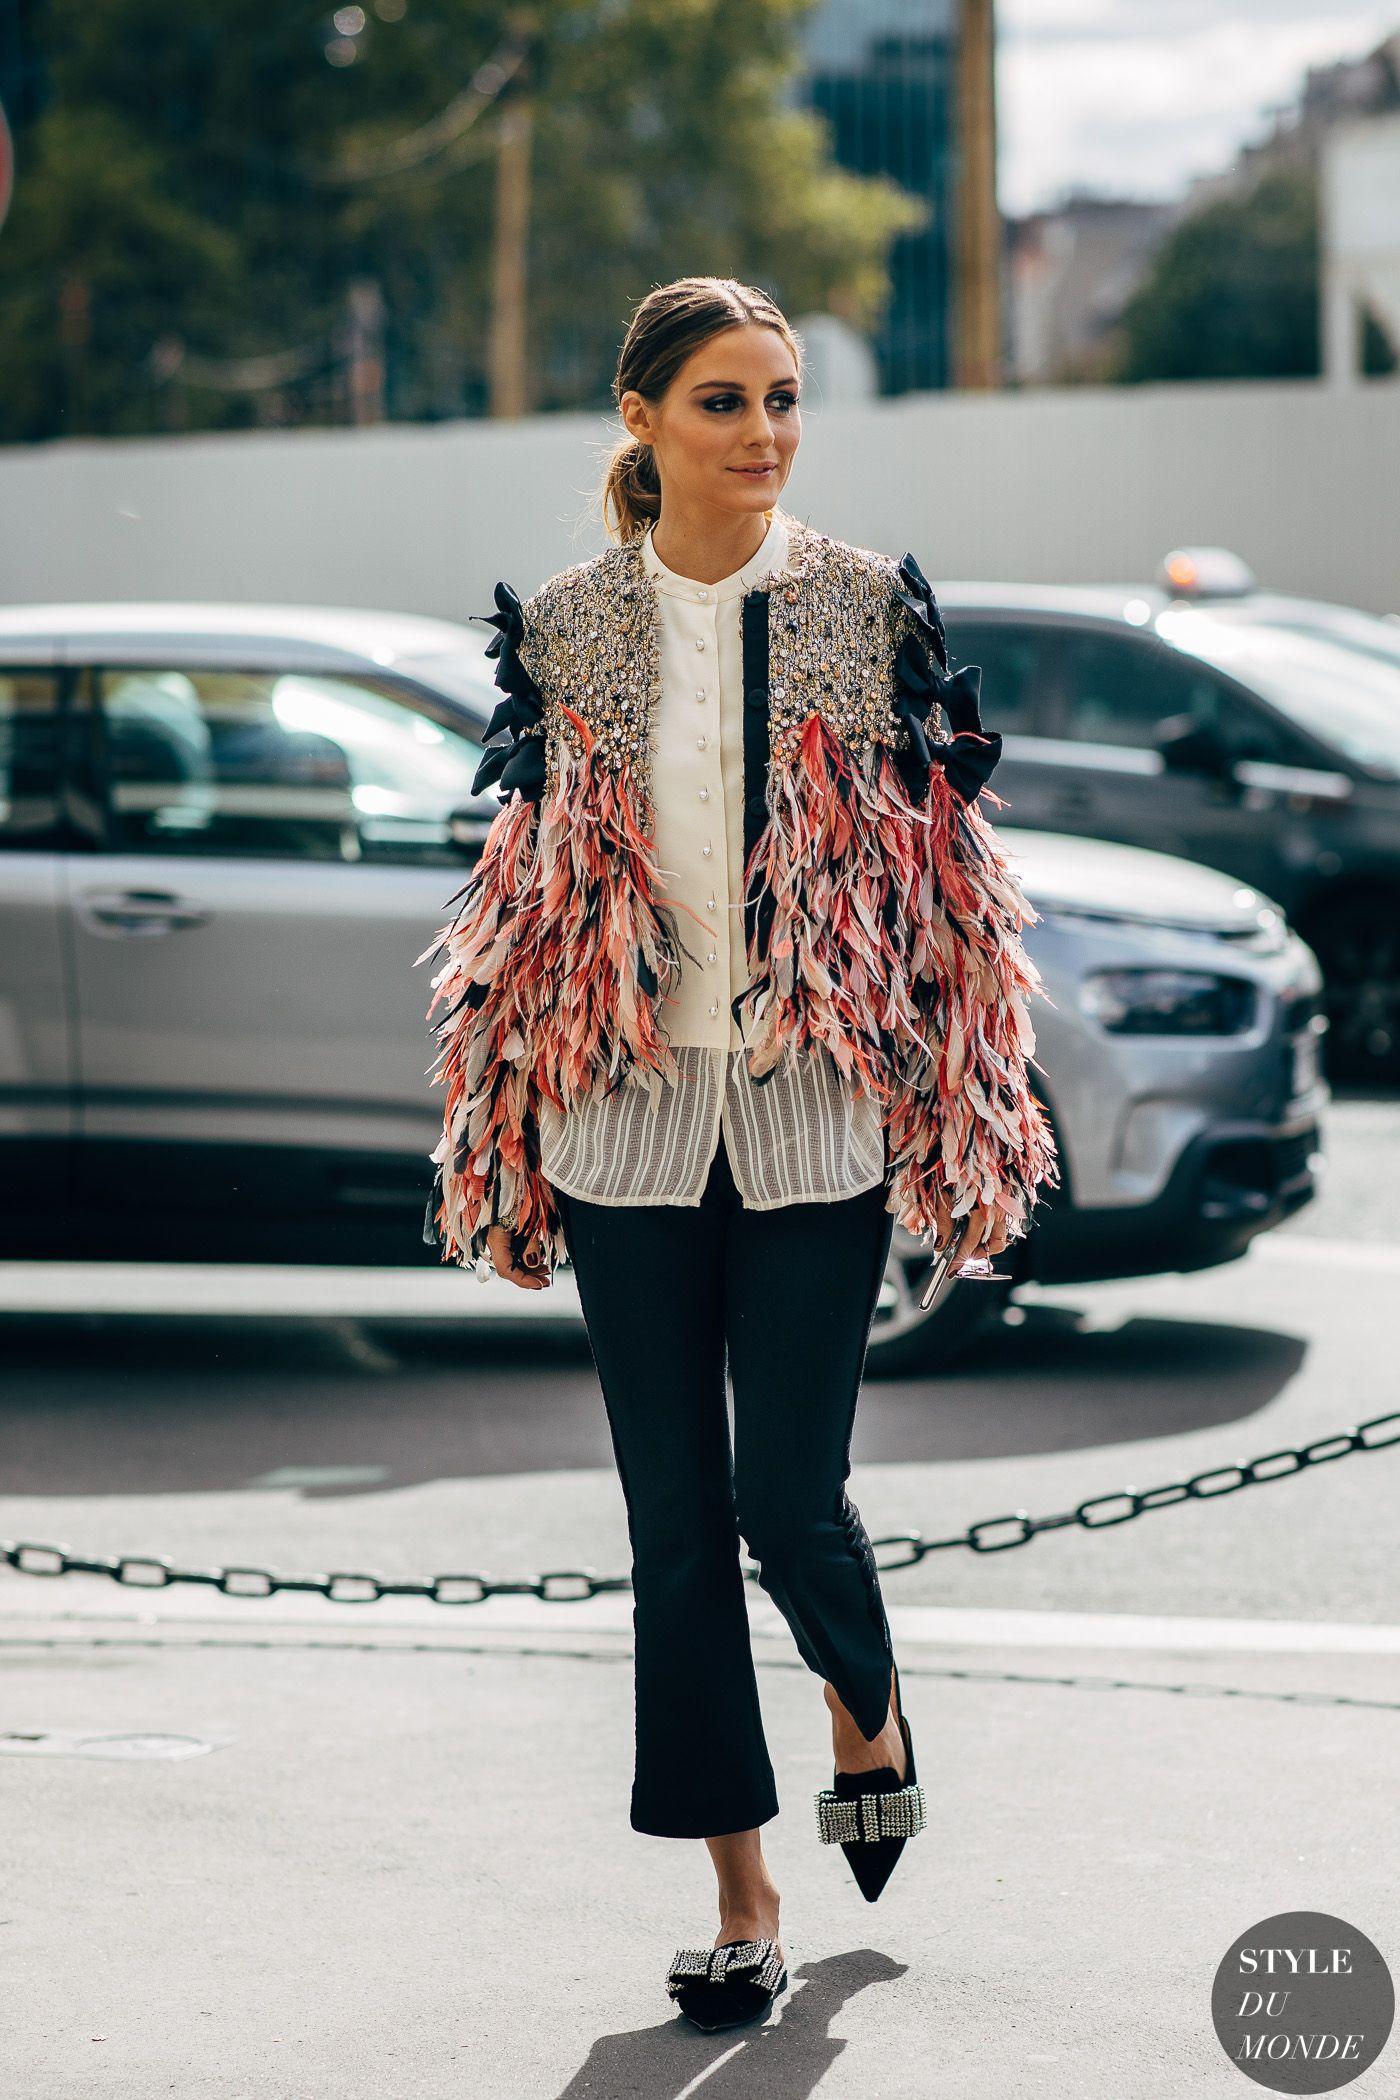 Paris SS 2019 Street Style: Olivia Palermo - STYLE